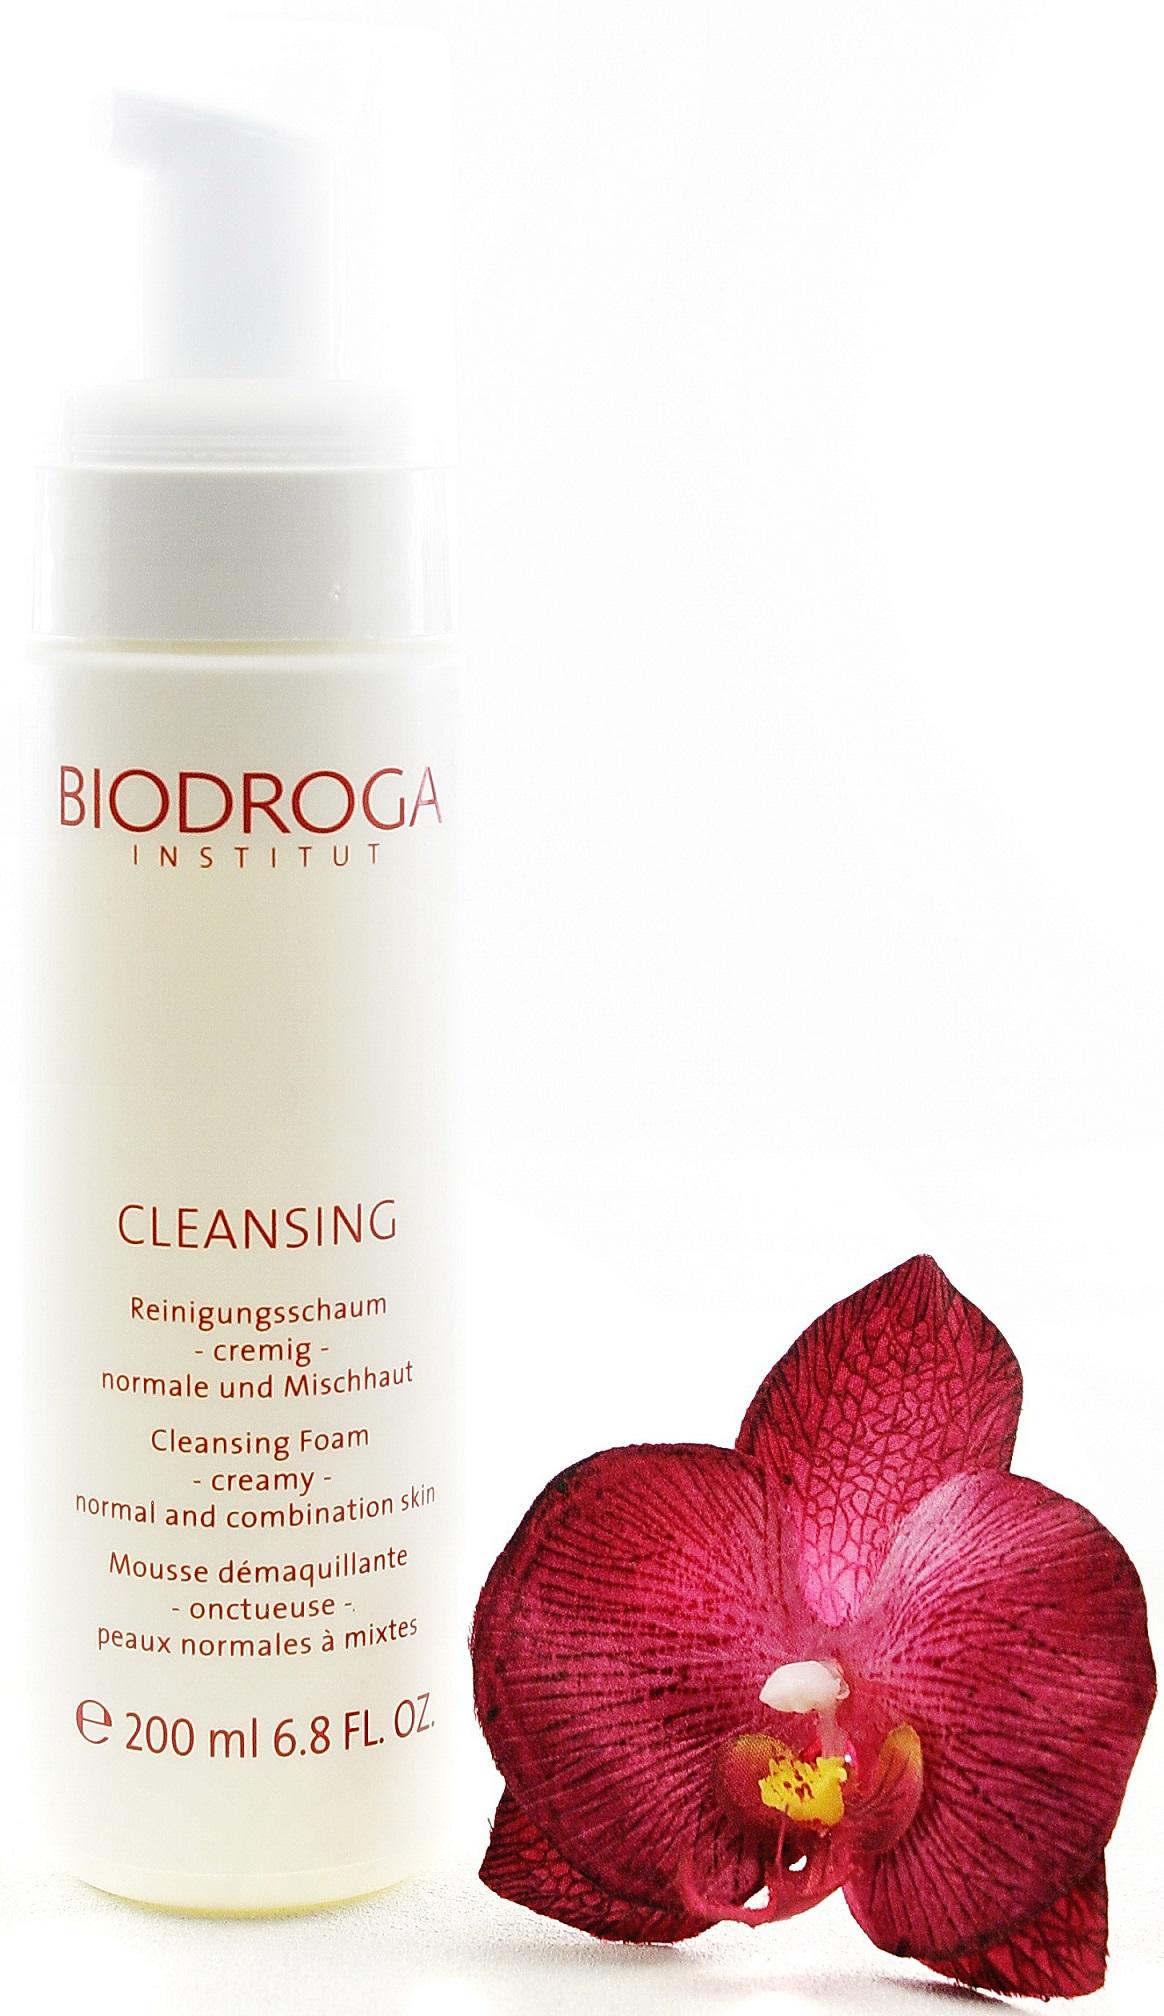 IMG_1308-2 Biodroga Cleansing Foam Creamy Normal and Combination Skin 200ml